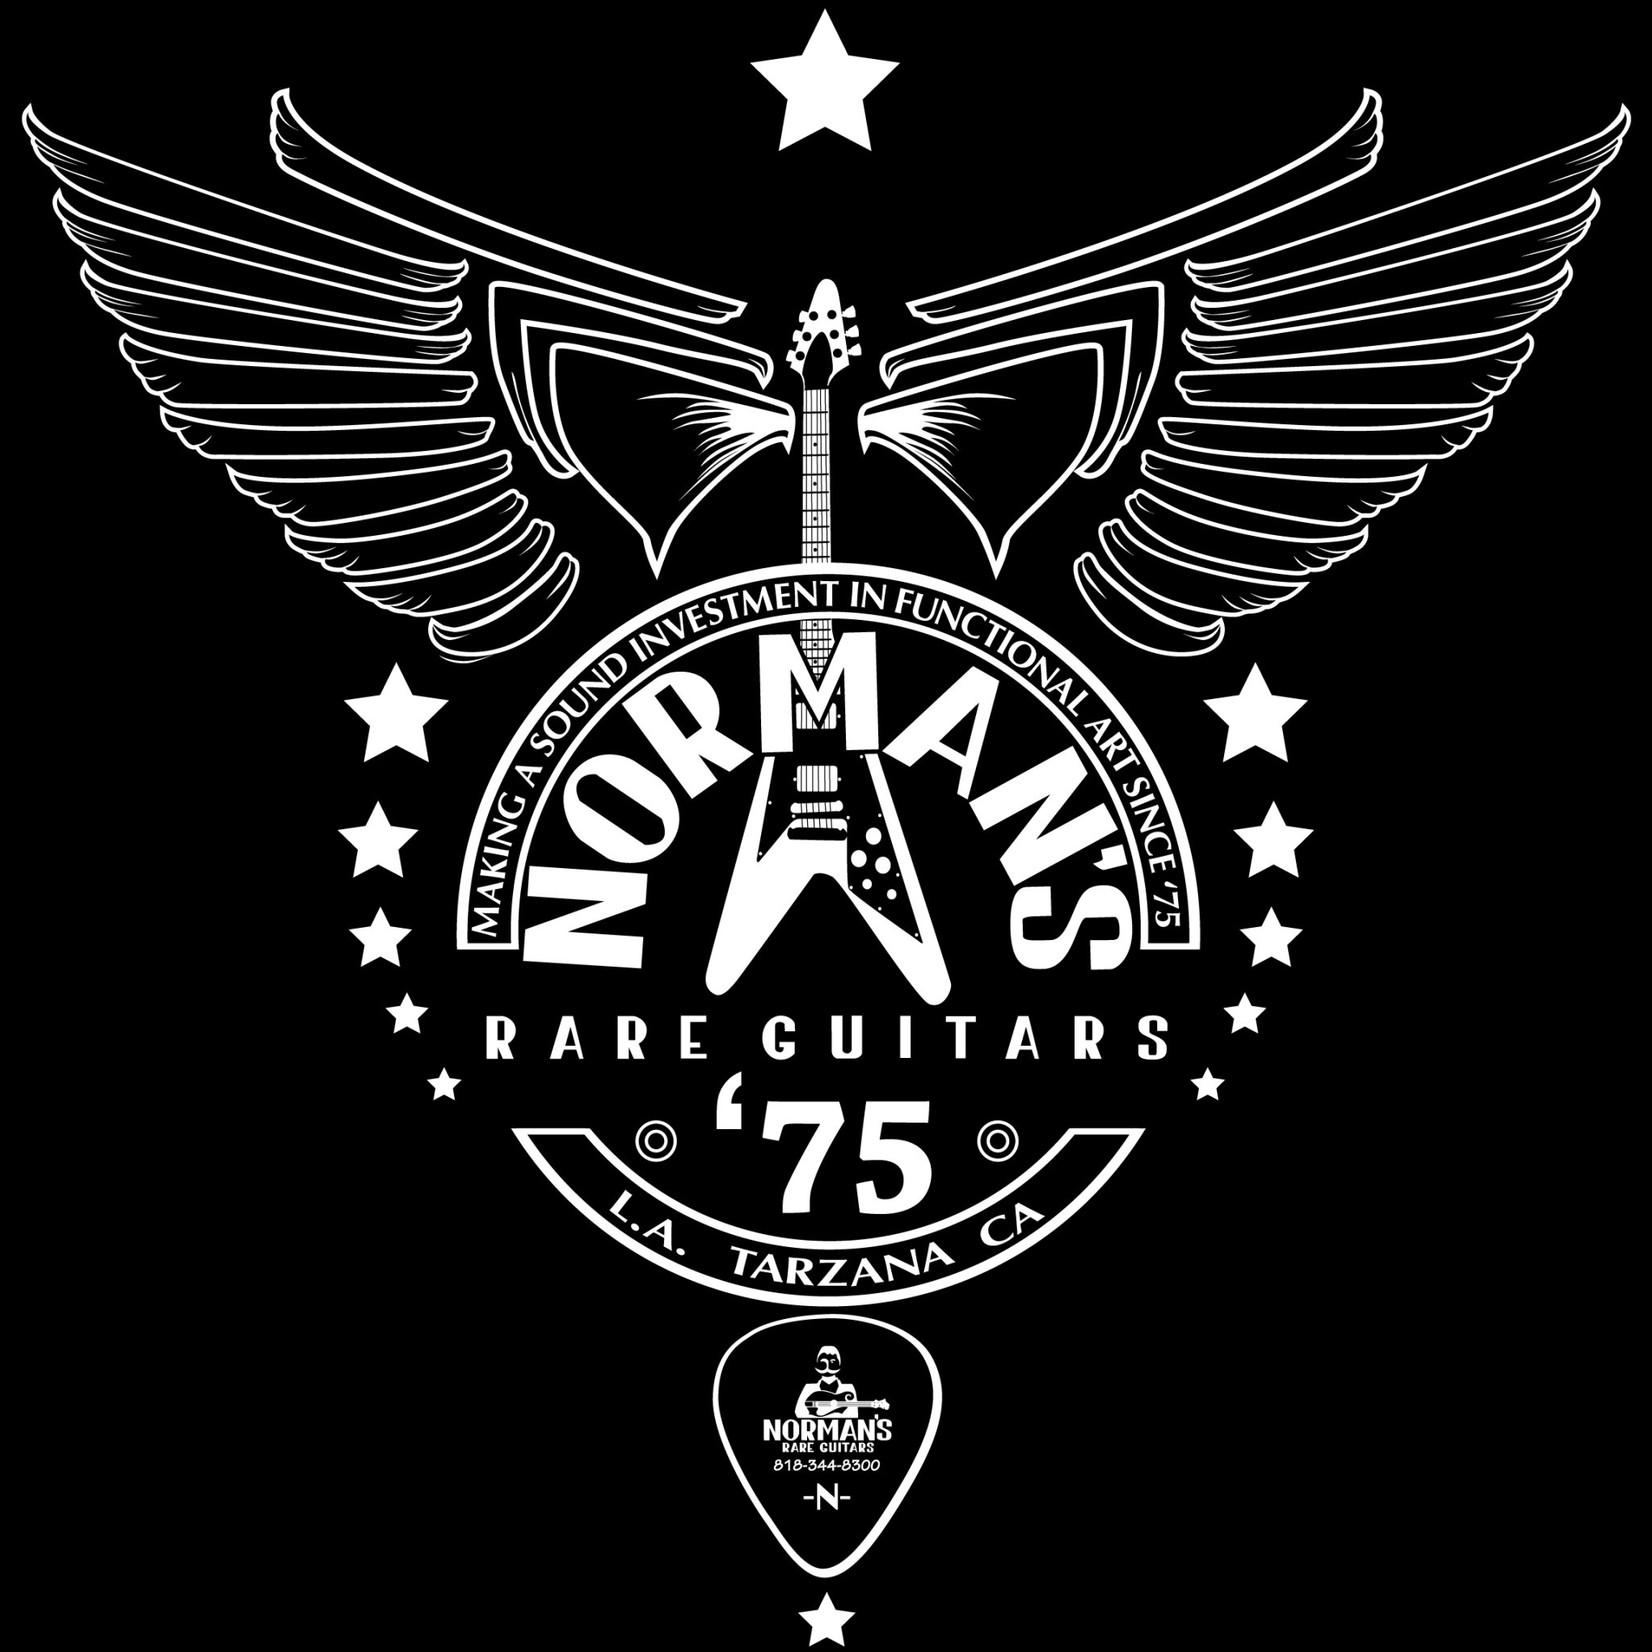 Norman's Rare Guitars Functional Art T-Shirt